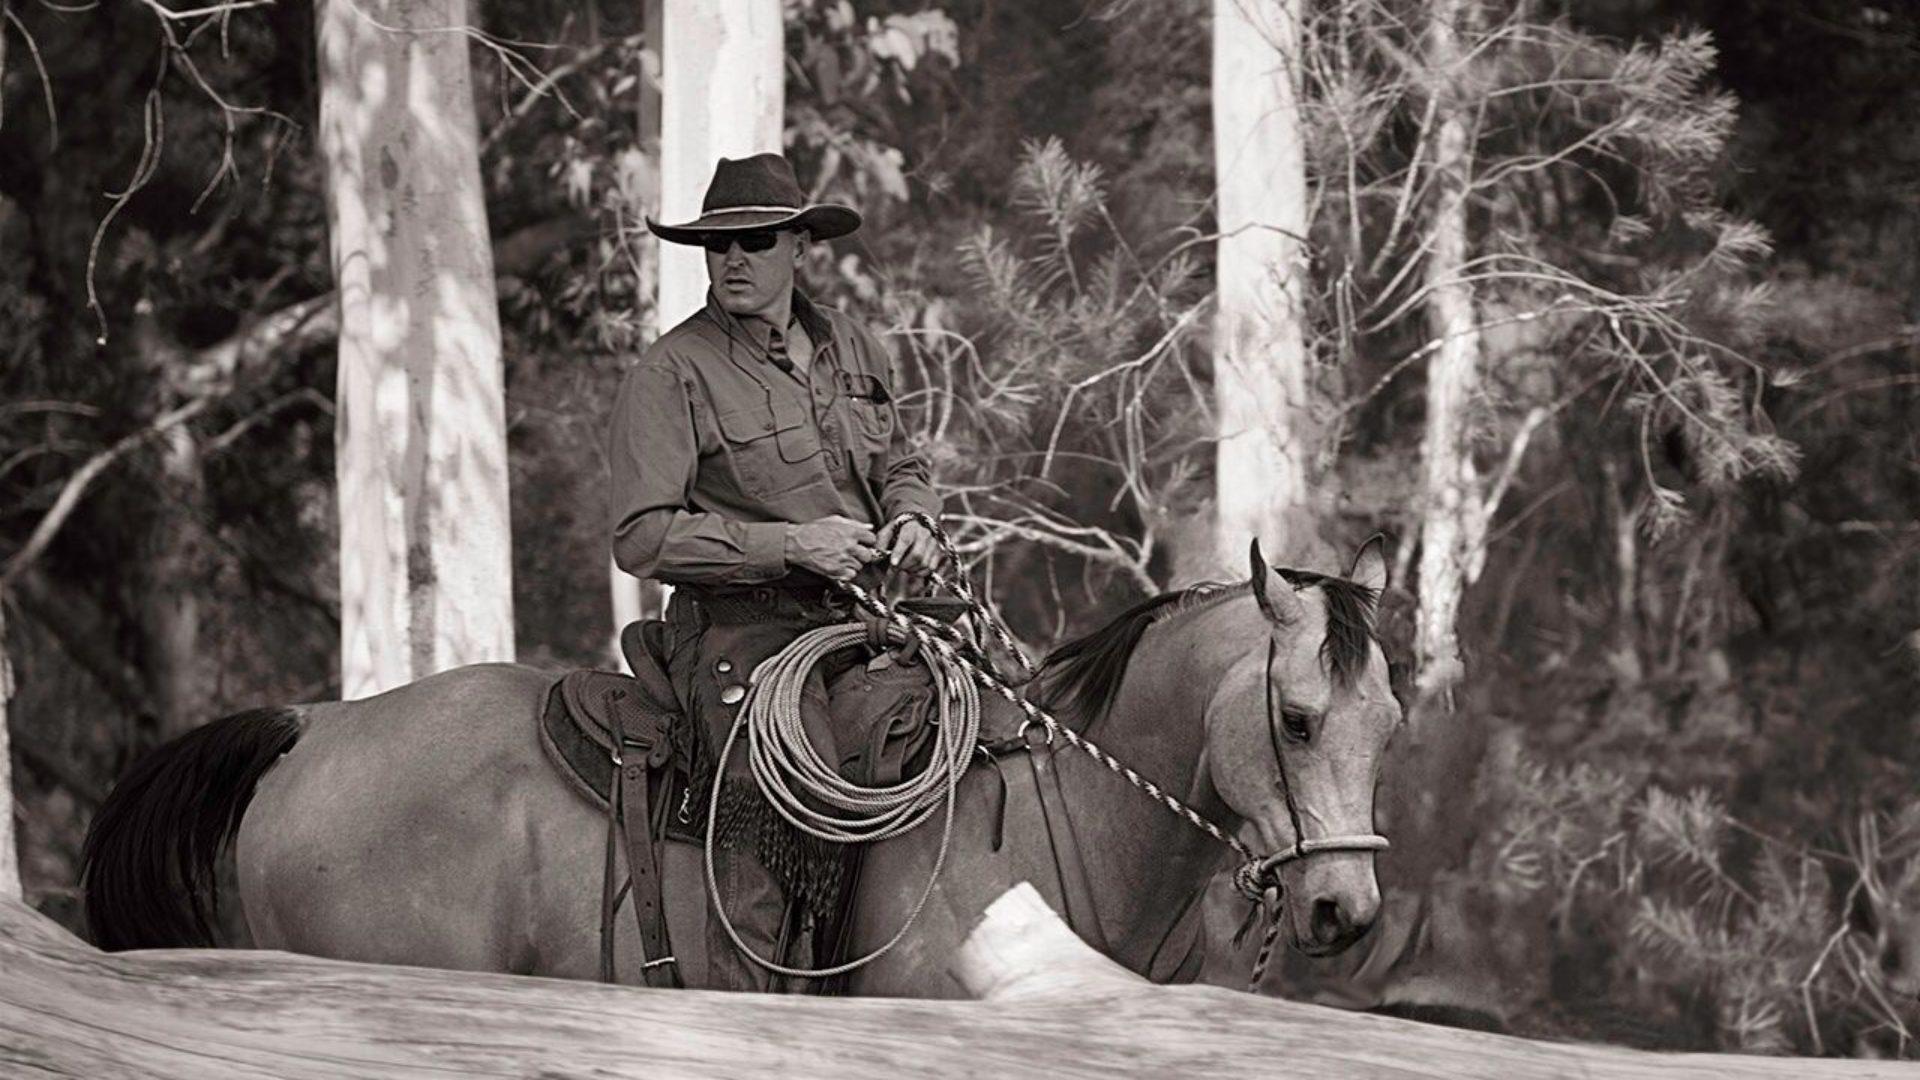 Reata Ranch Horsemanship